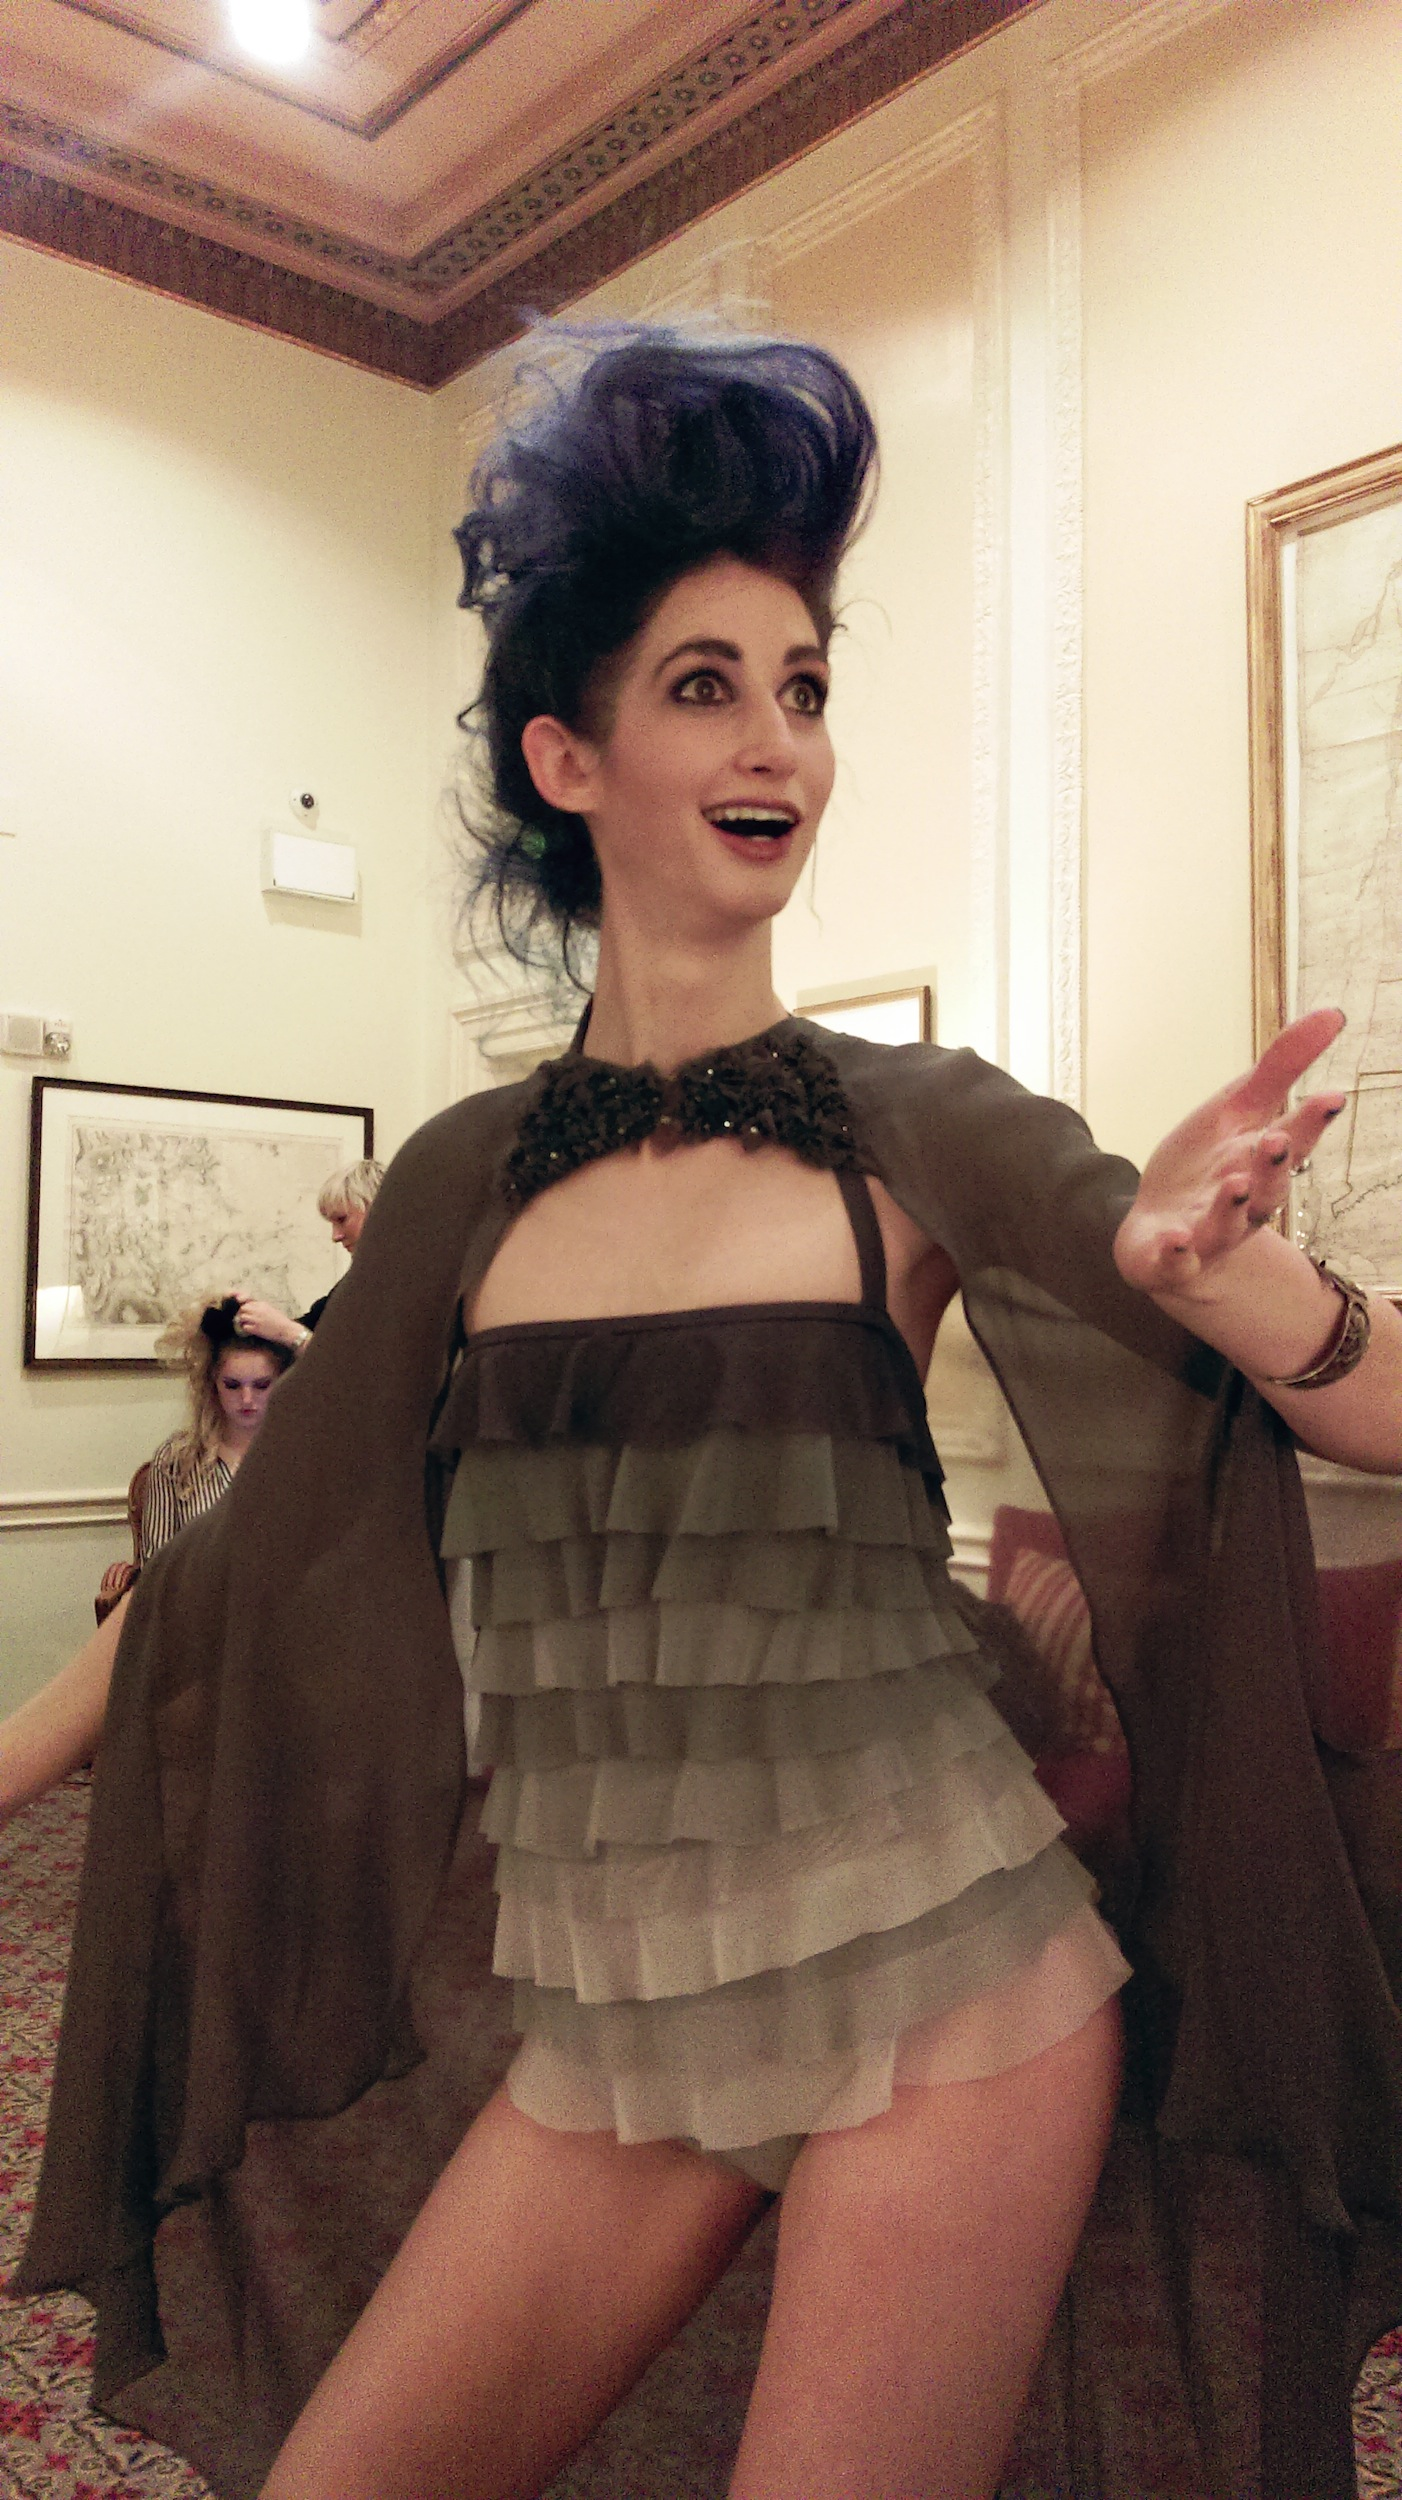 Geena Matuson (@geenamatuson) just after hair and make-up with Che Maksou for runway show, 2014.